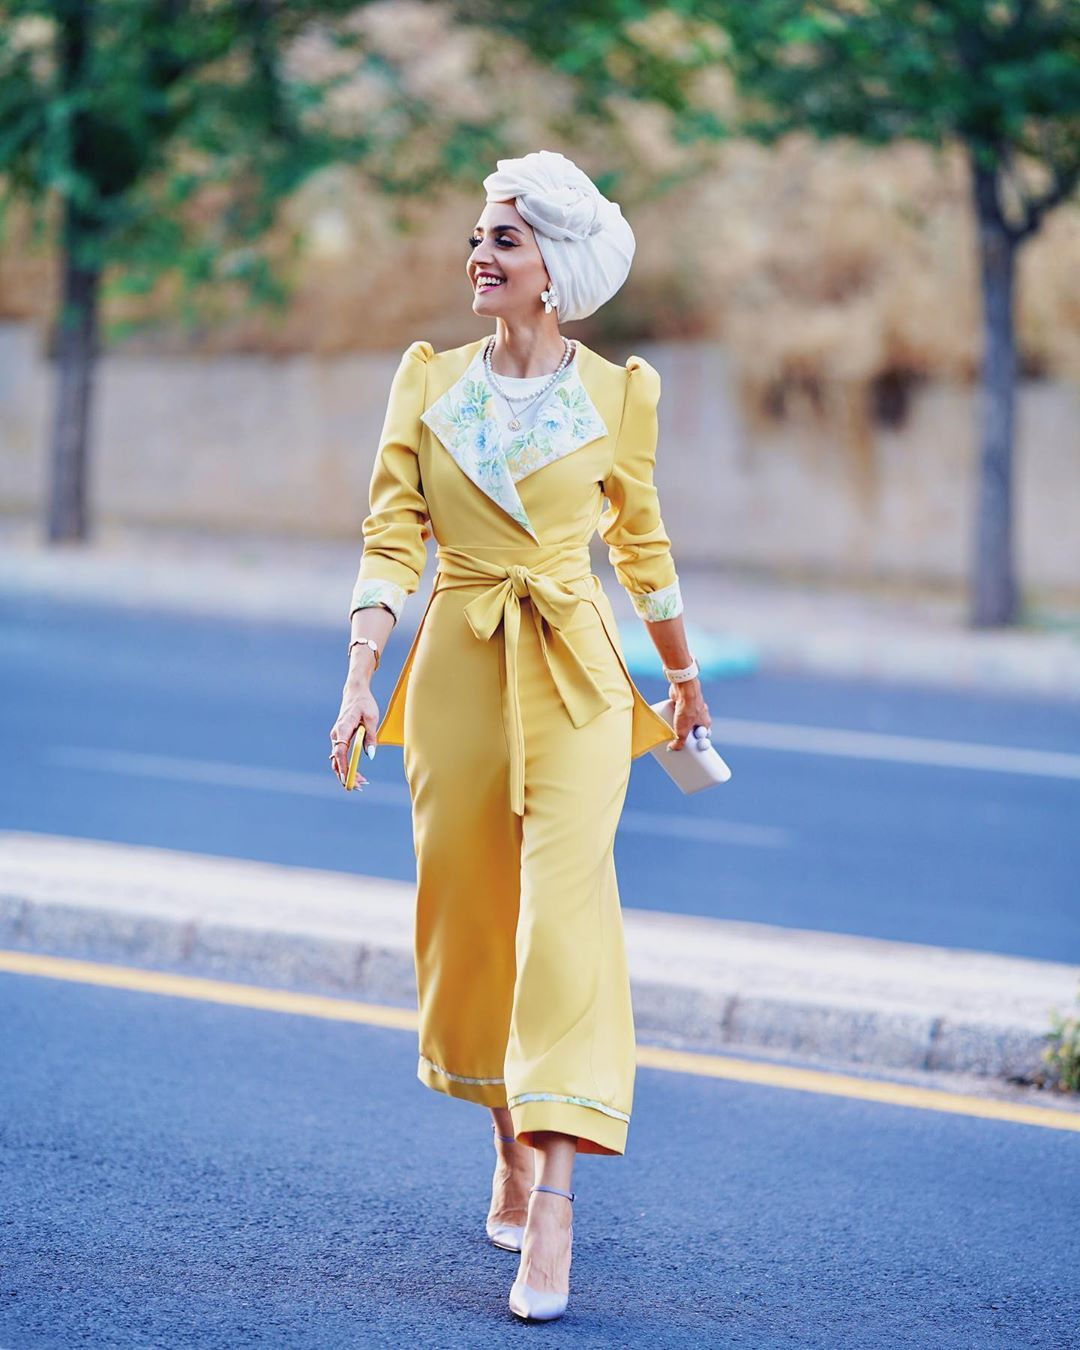 21 9 K Mentions J Aime 218 Commentaires غادة عثمان Ghada Othman Sur Instagram أنس وين حابه نصور أنا بالشارع أنس او Hijab Fashion Fashion Style